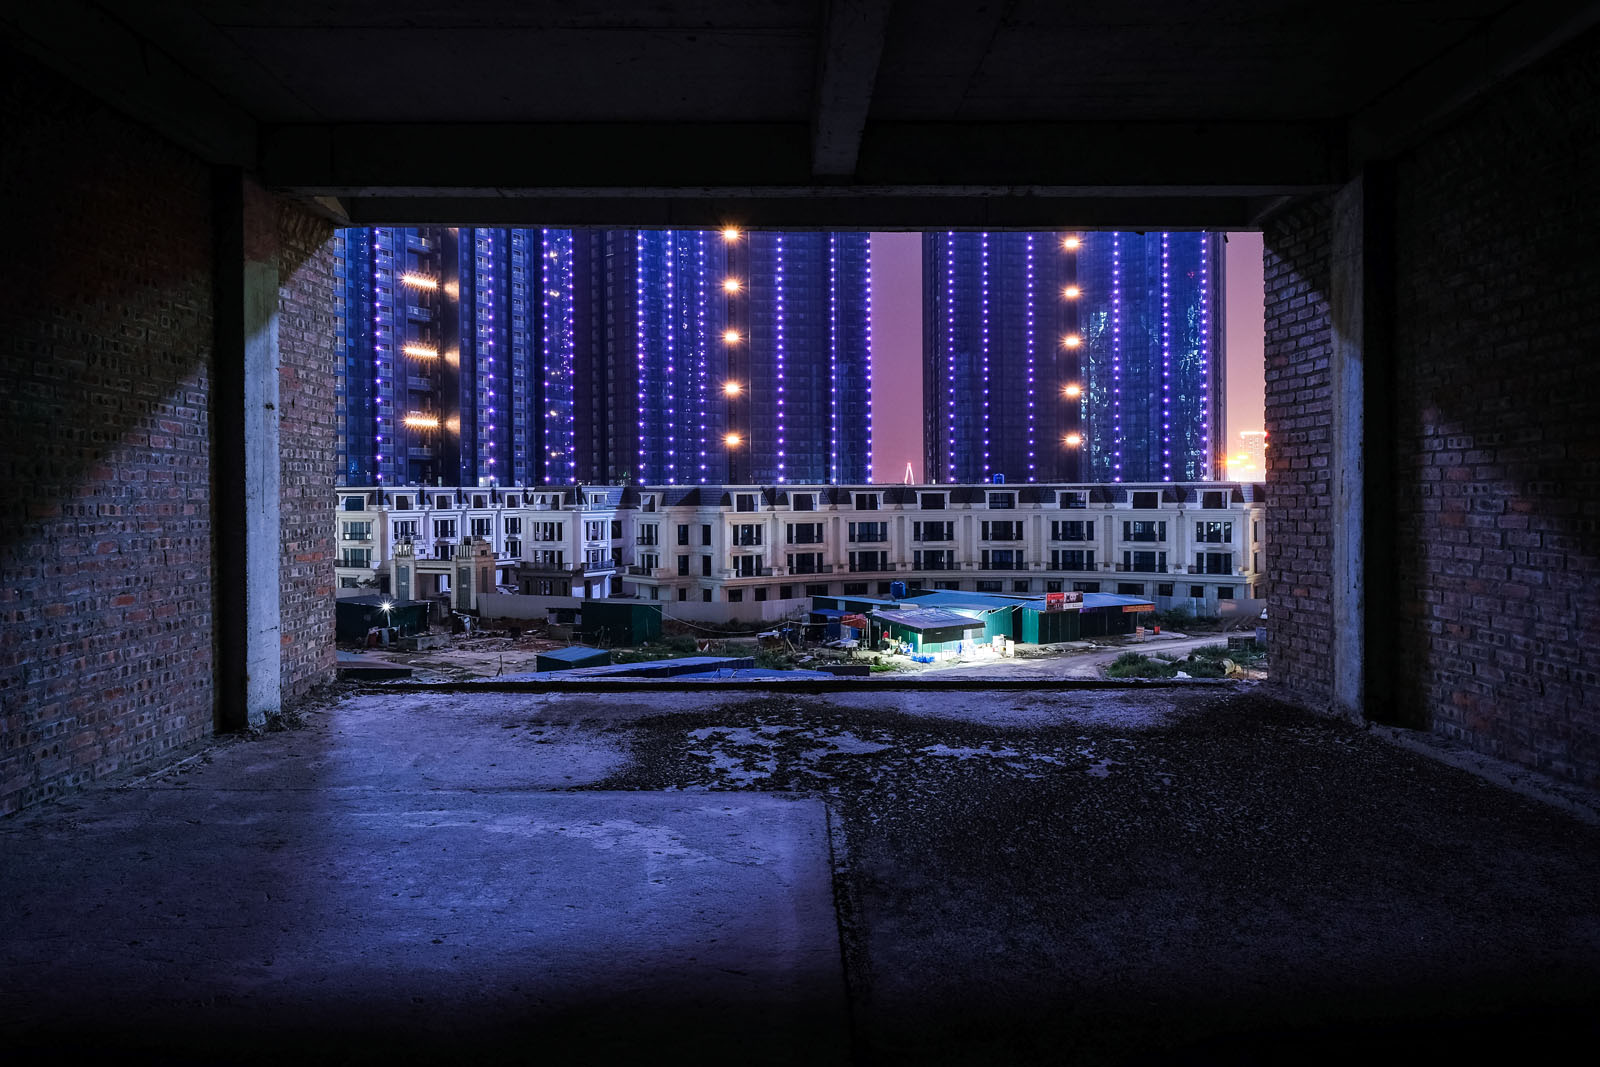 Belgian photographer uncovers spirit of Hanoi's concrete jungle